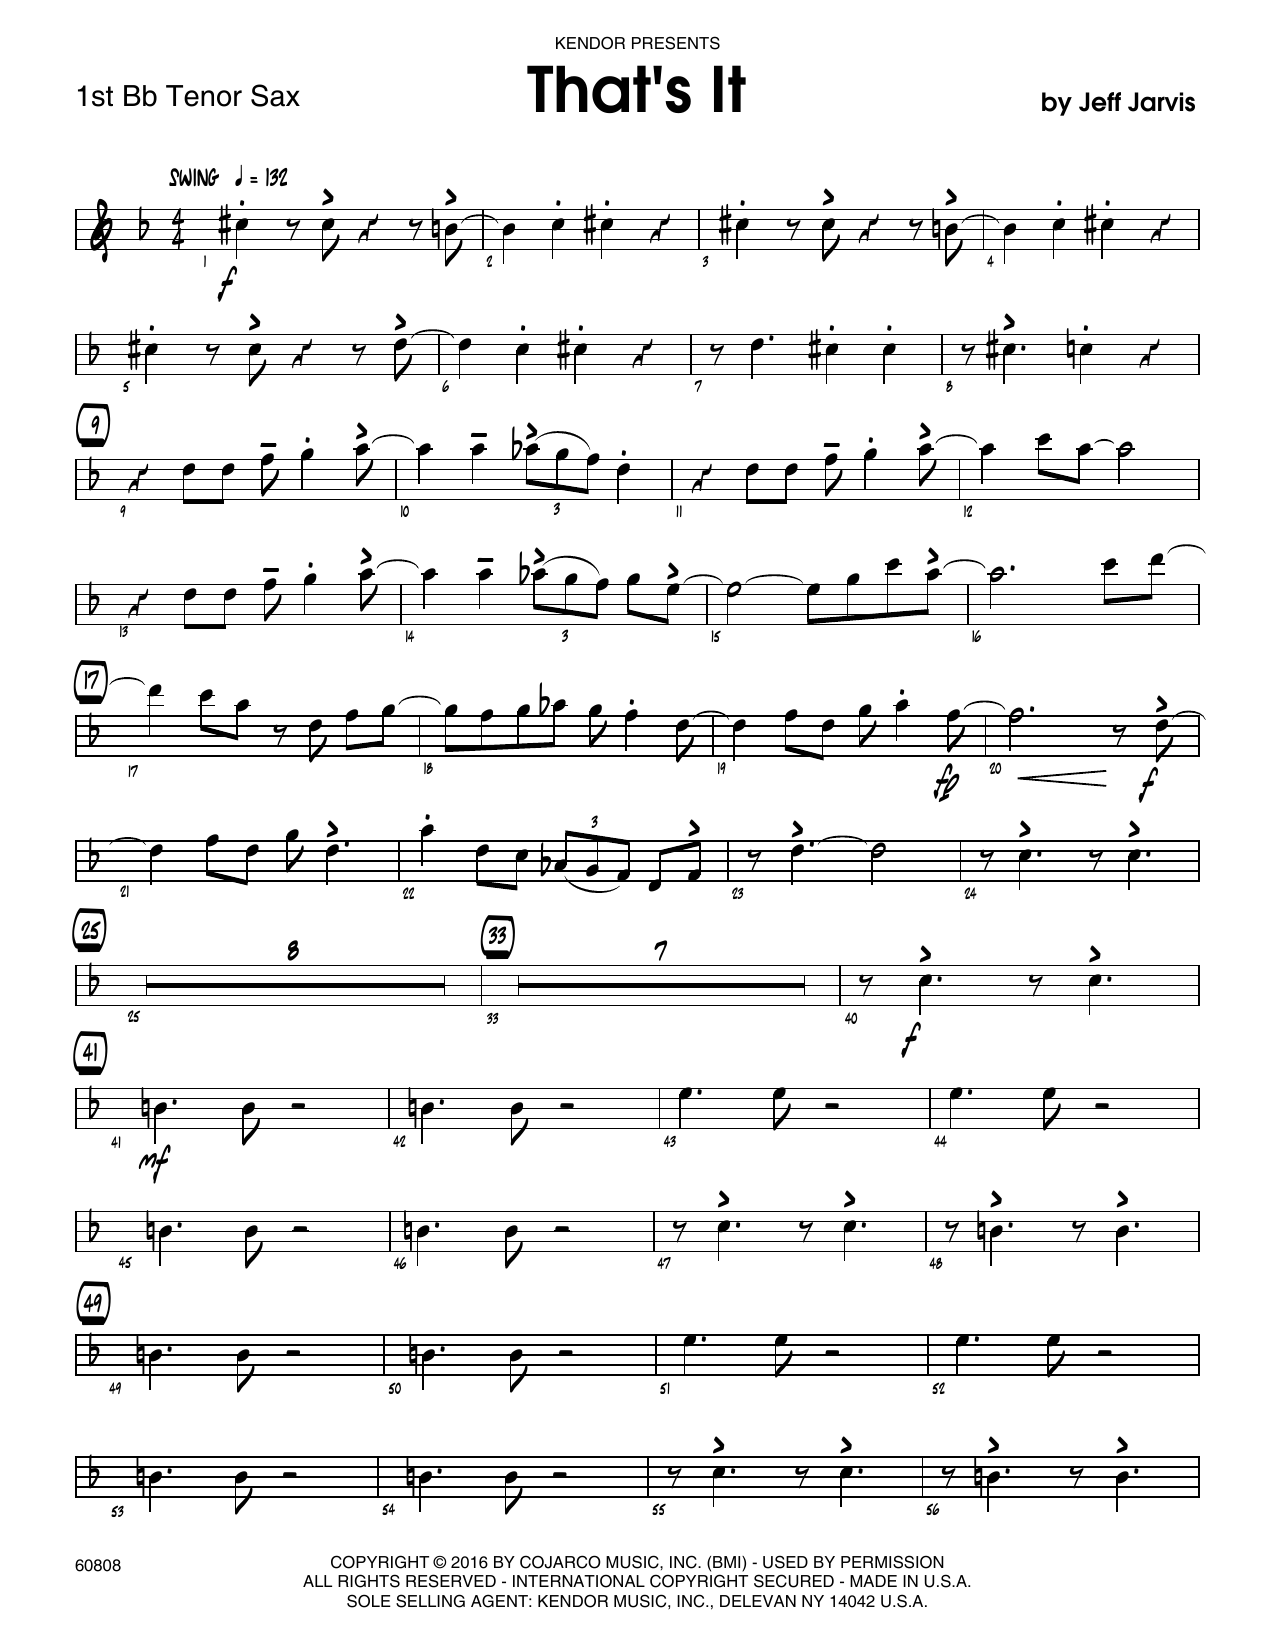 That's It - 1st Tenor Saxophone Sheet Music